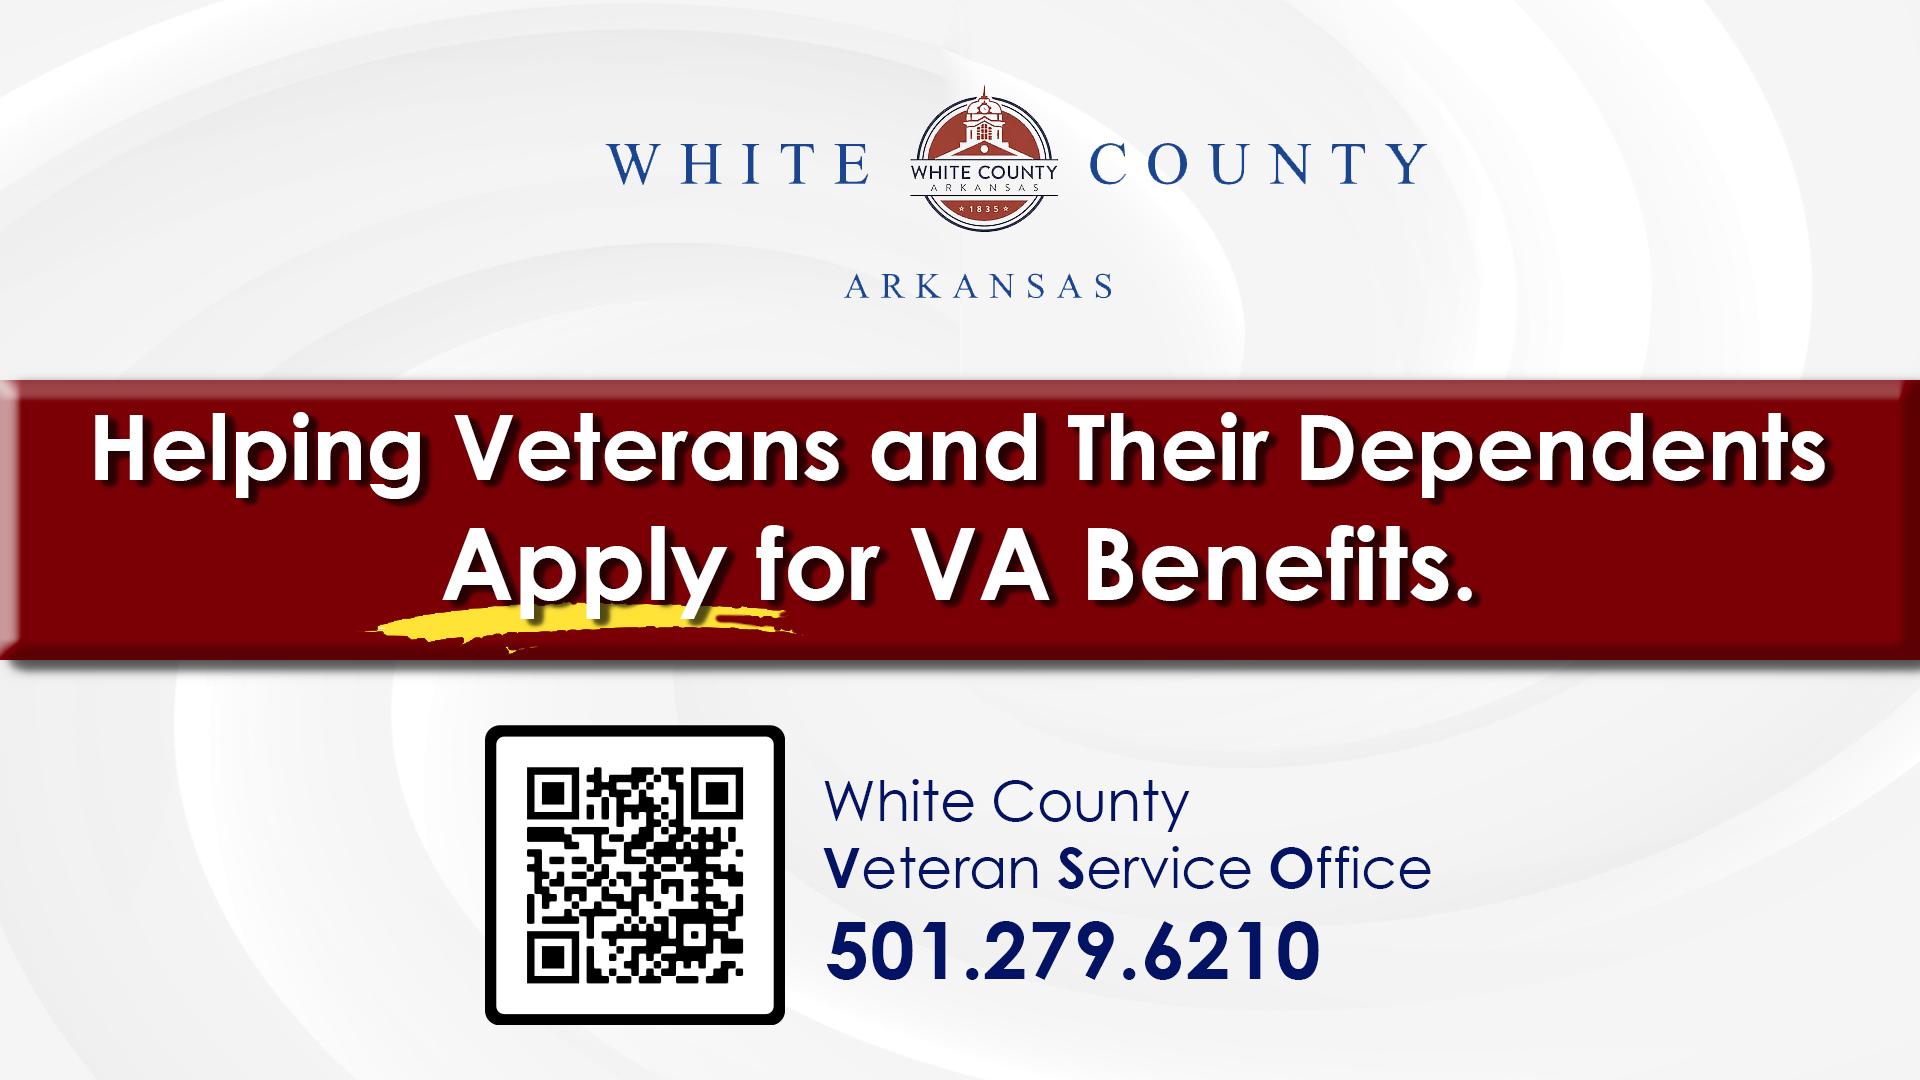 Veteran services - White